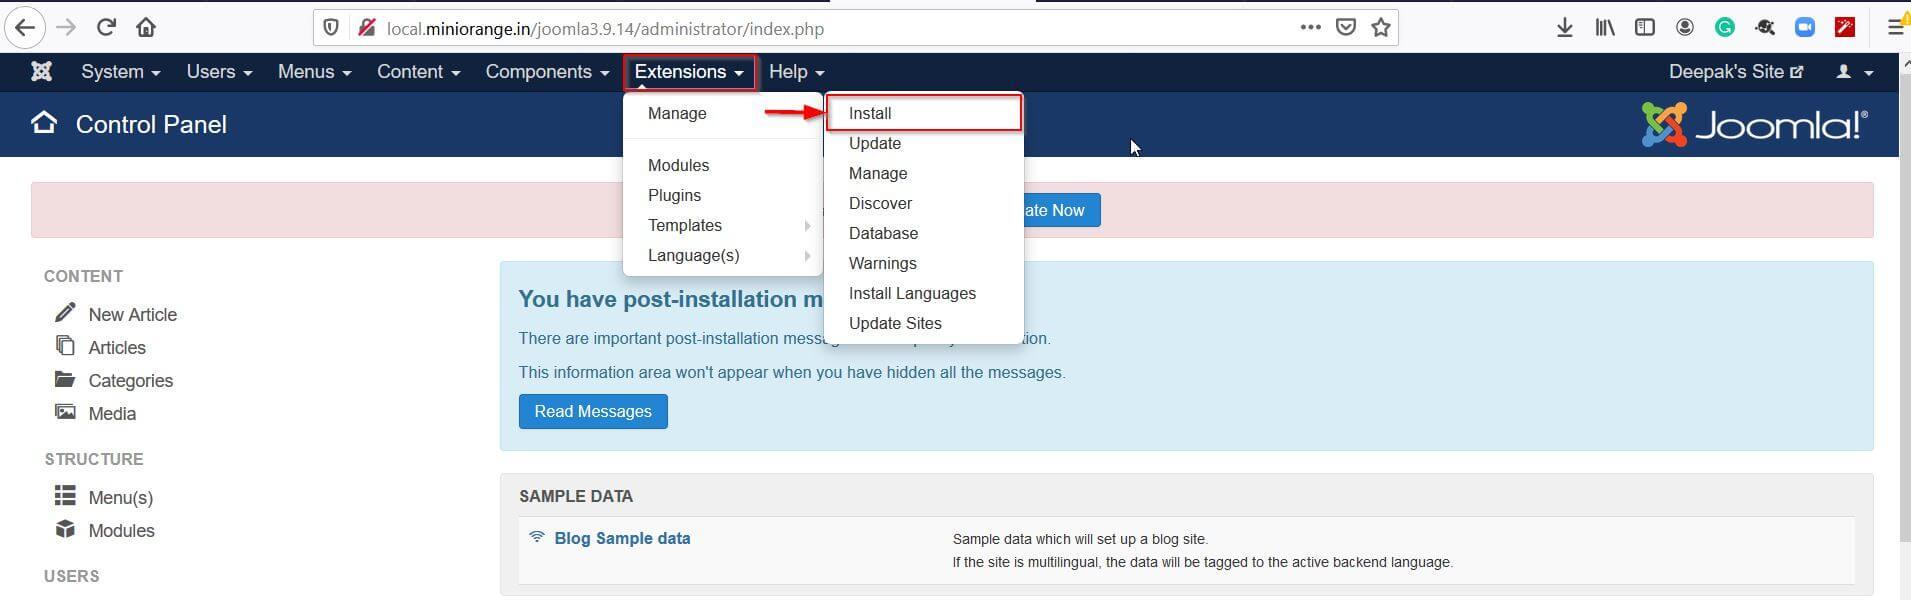 Joomla OAuth Client Plugin - Install